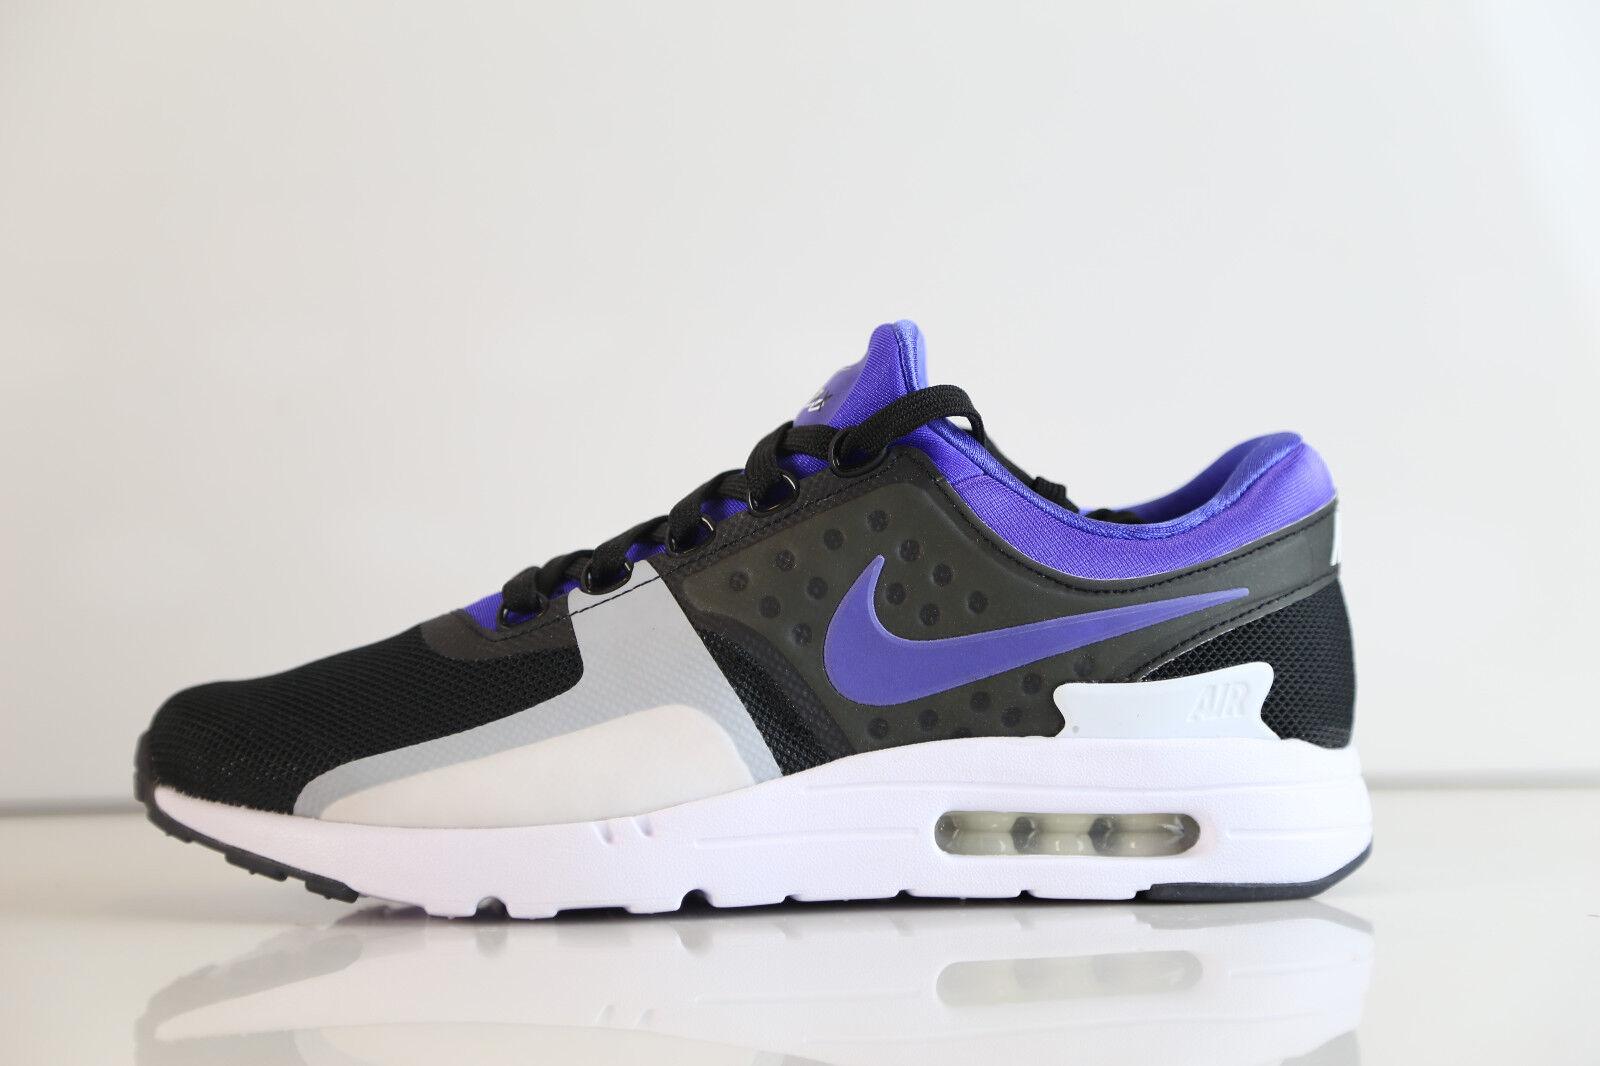 Nike Air Max Zero QS Violeta Persa - Blanco Negro 789695-004 8 - Persa 13 1 Supreme 90 3 0392a8